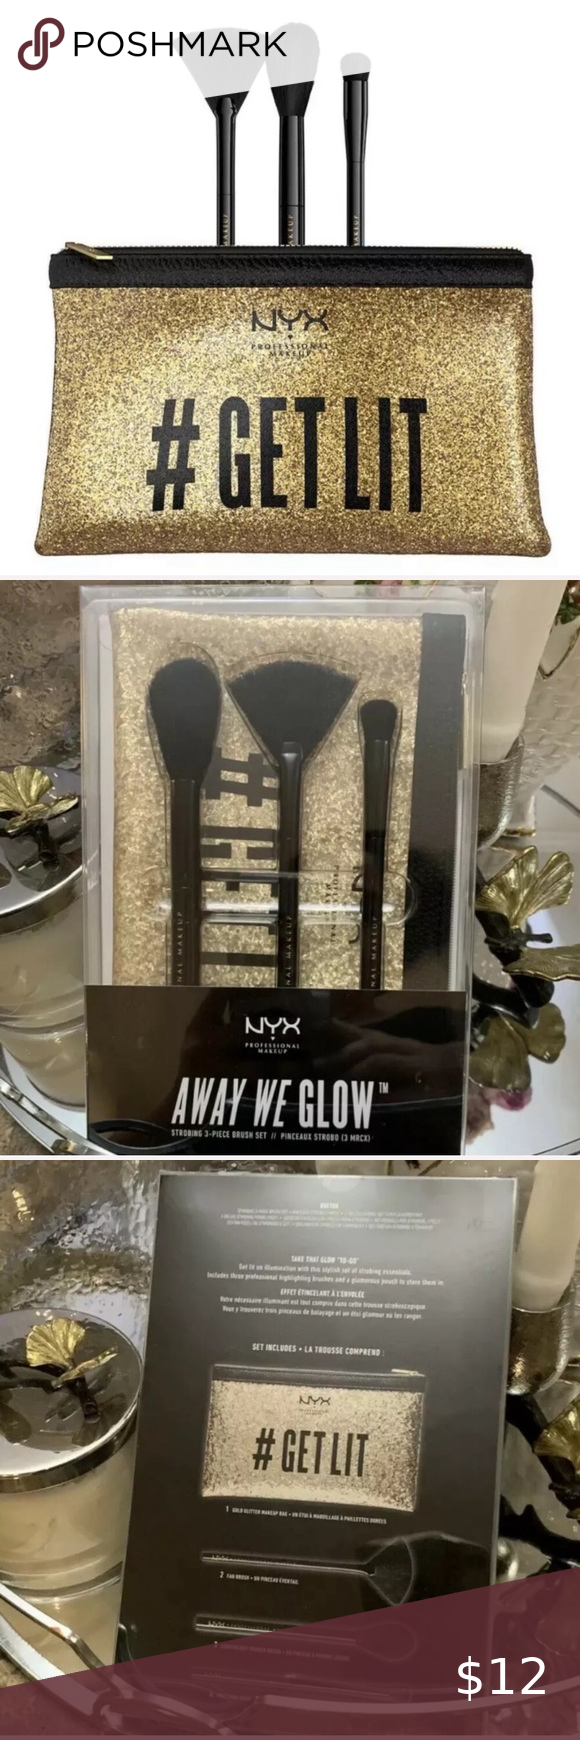 Away We Glow Brush Kit Brush kit with bag NWT NYX Makeup